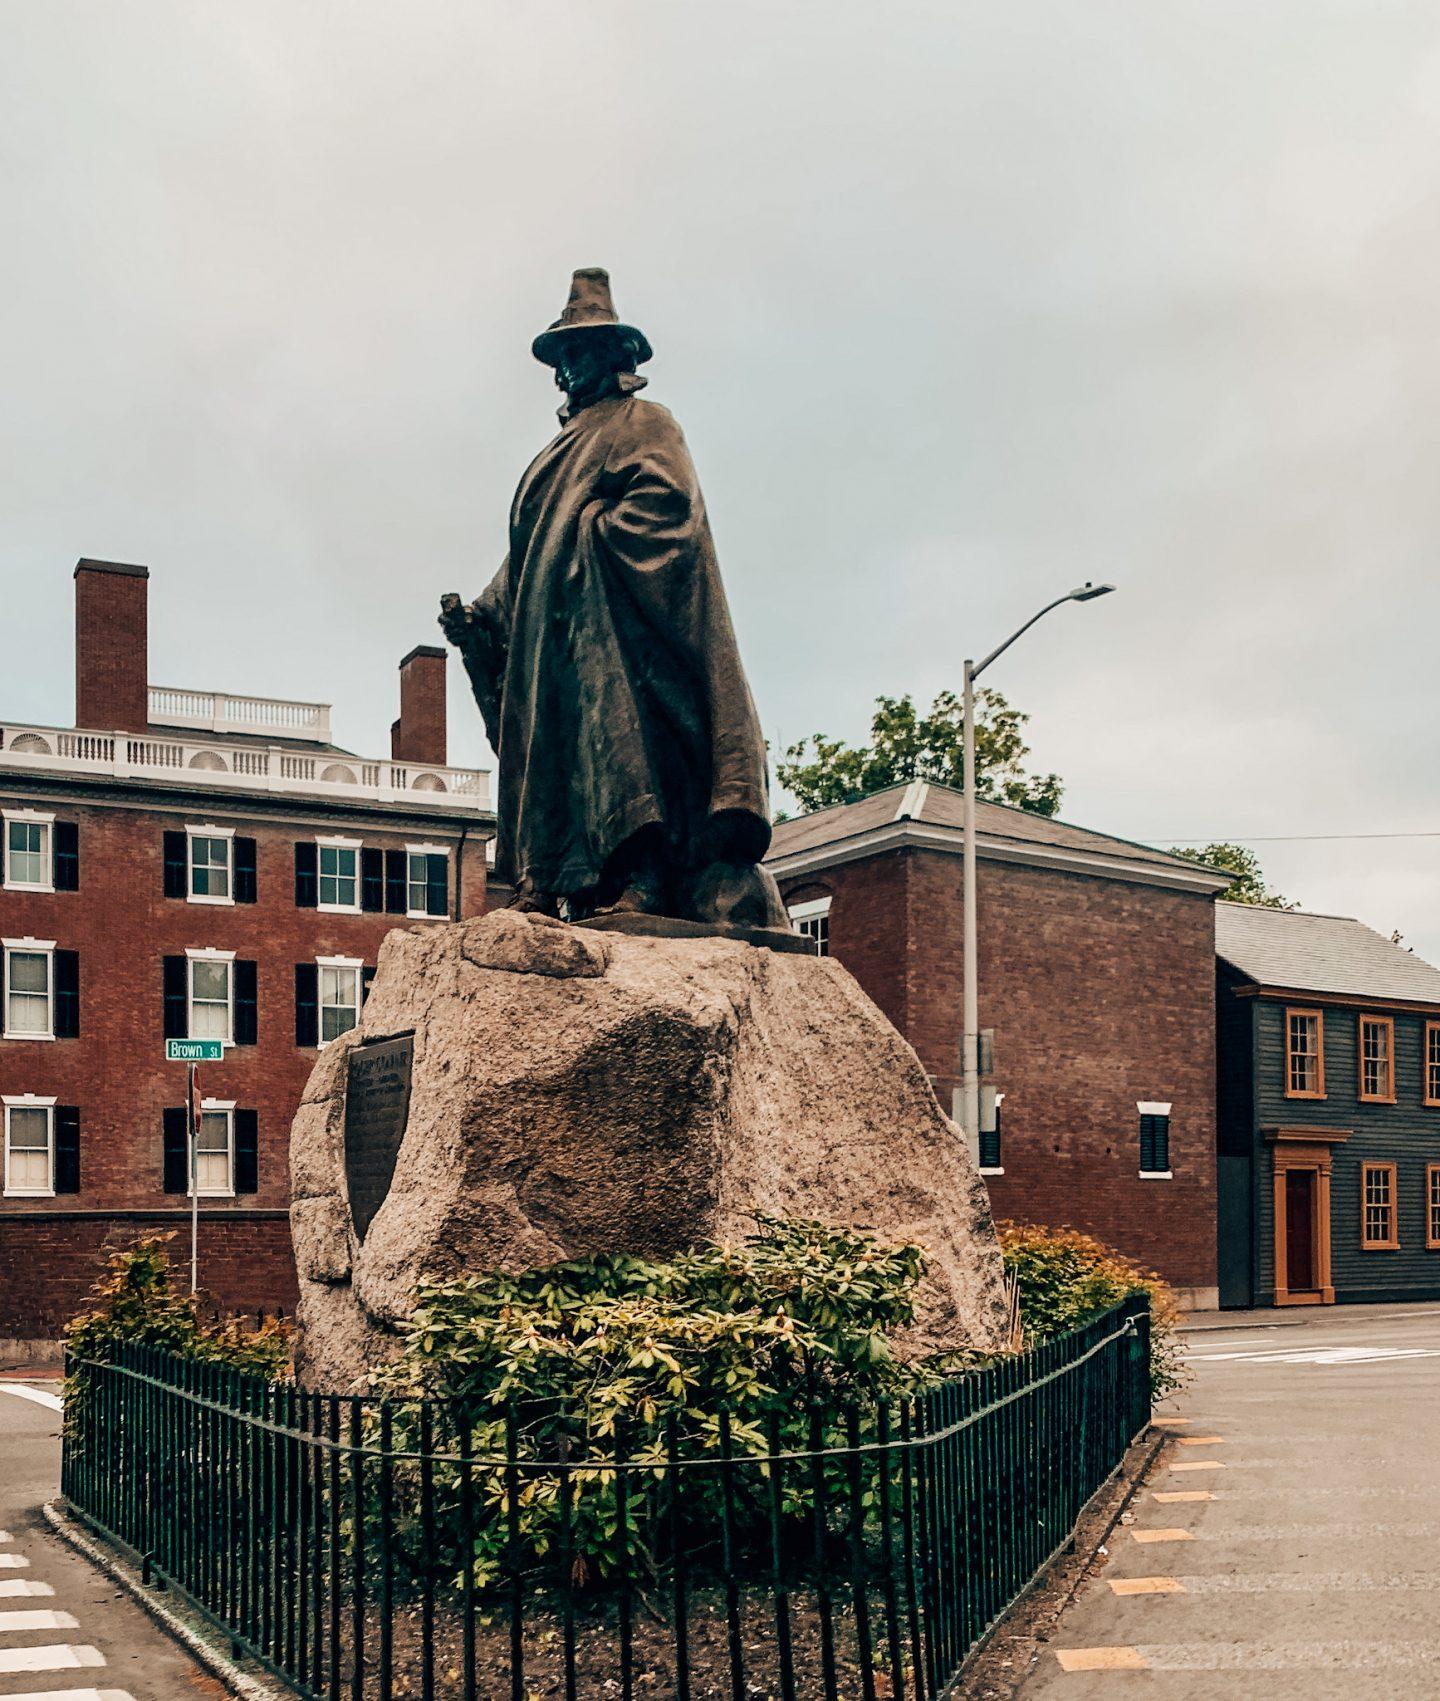 Downtown Salem, MA